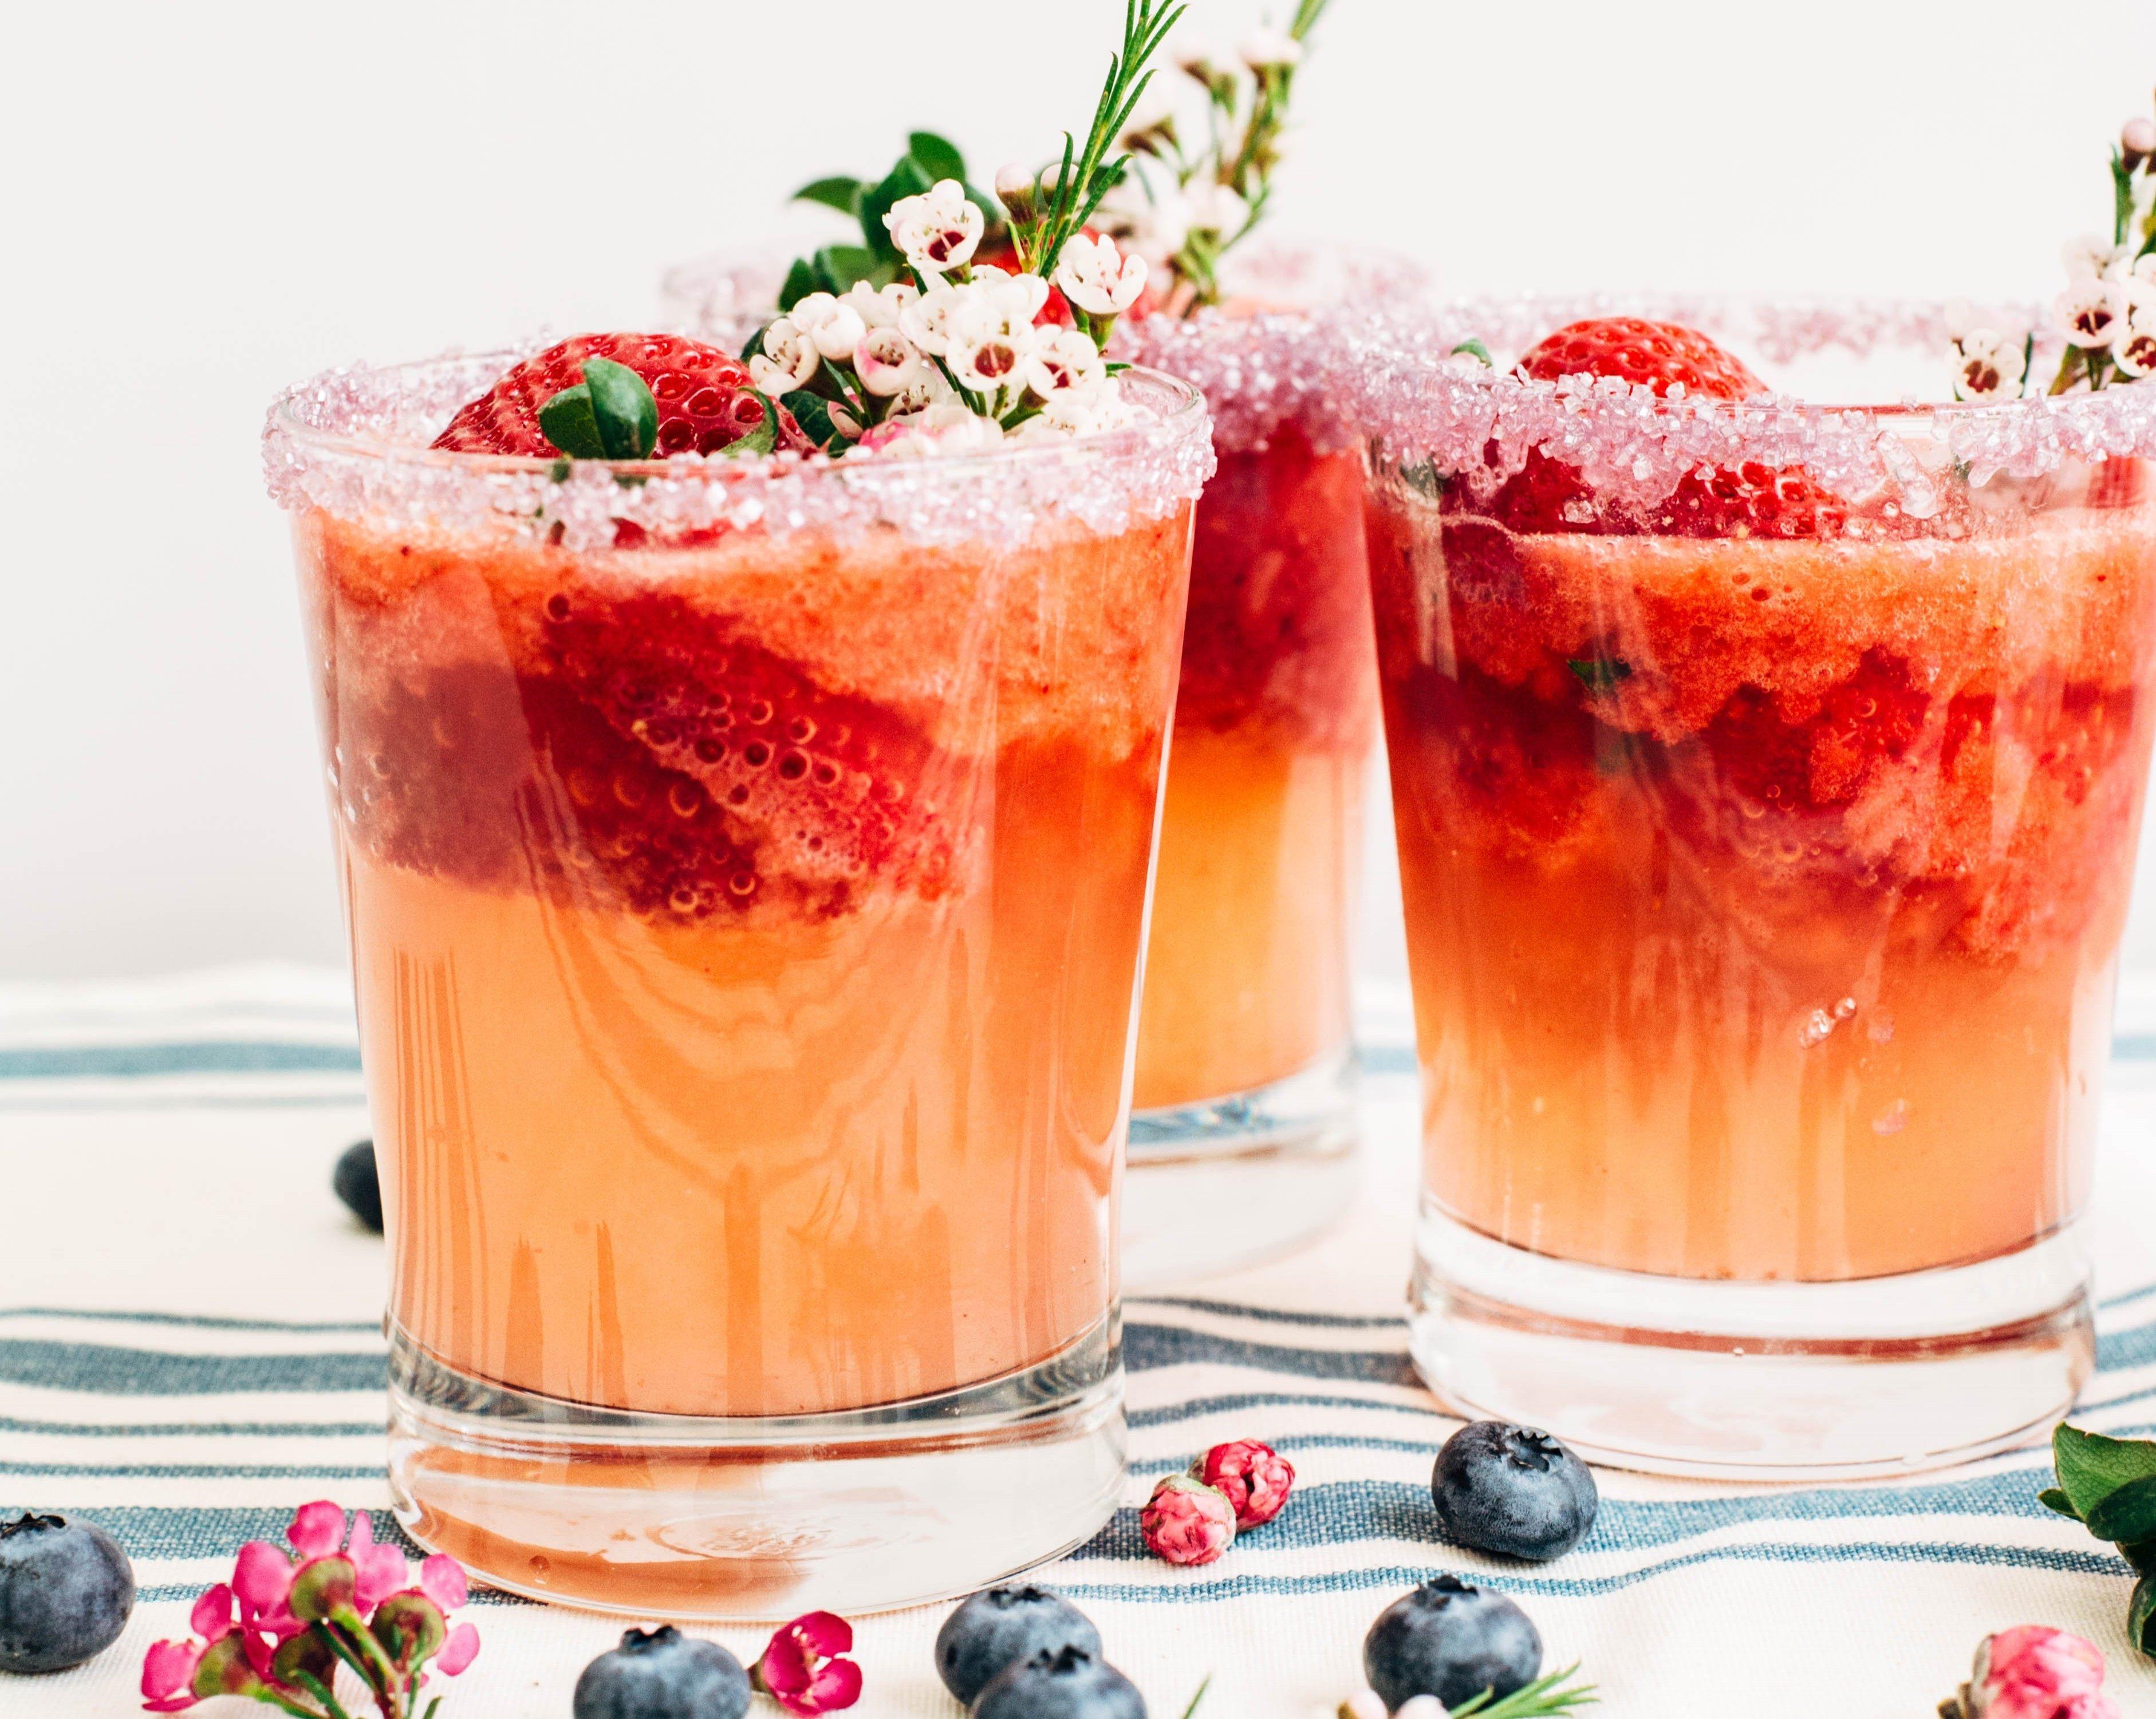 strawberry_lemonade_spritzer-16-838685-edited